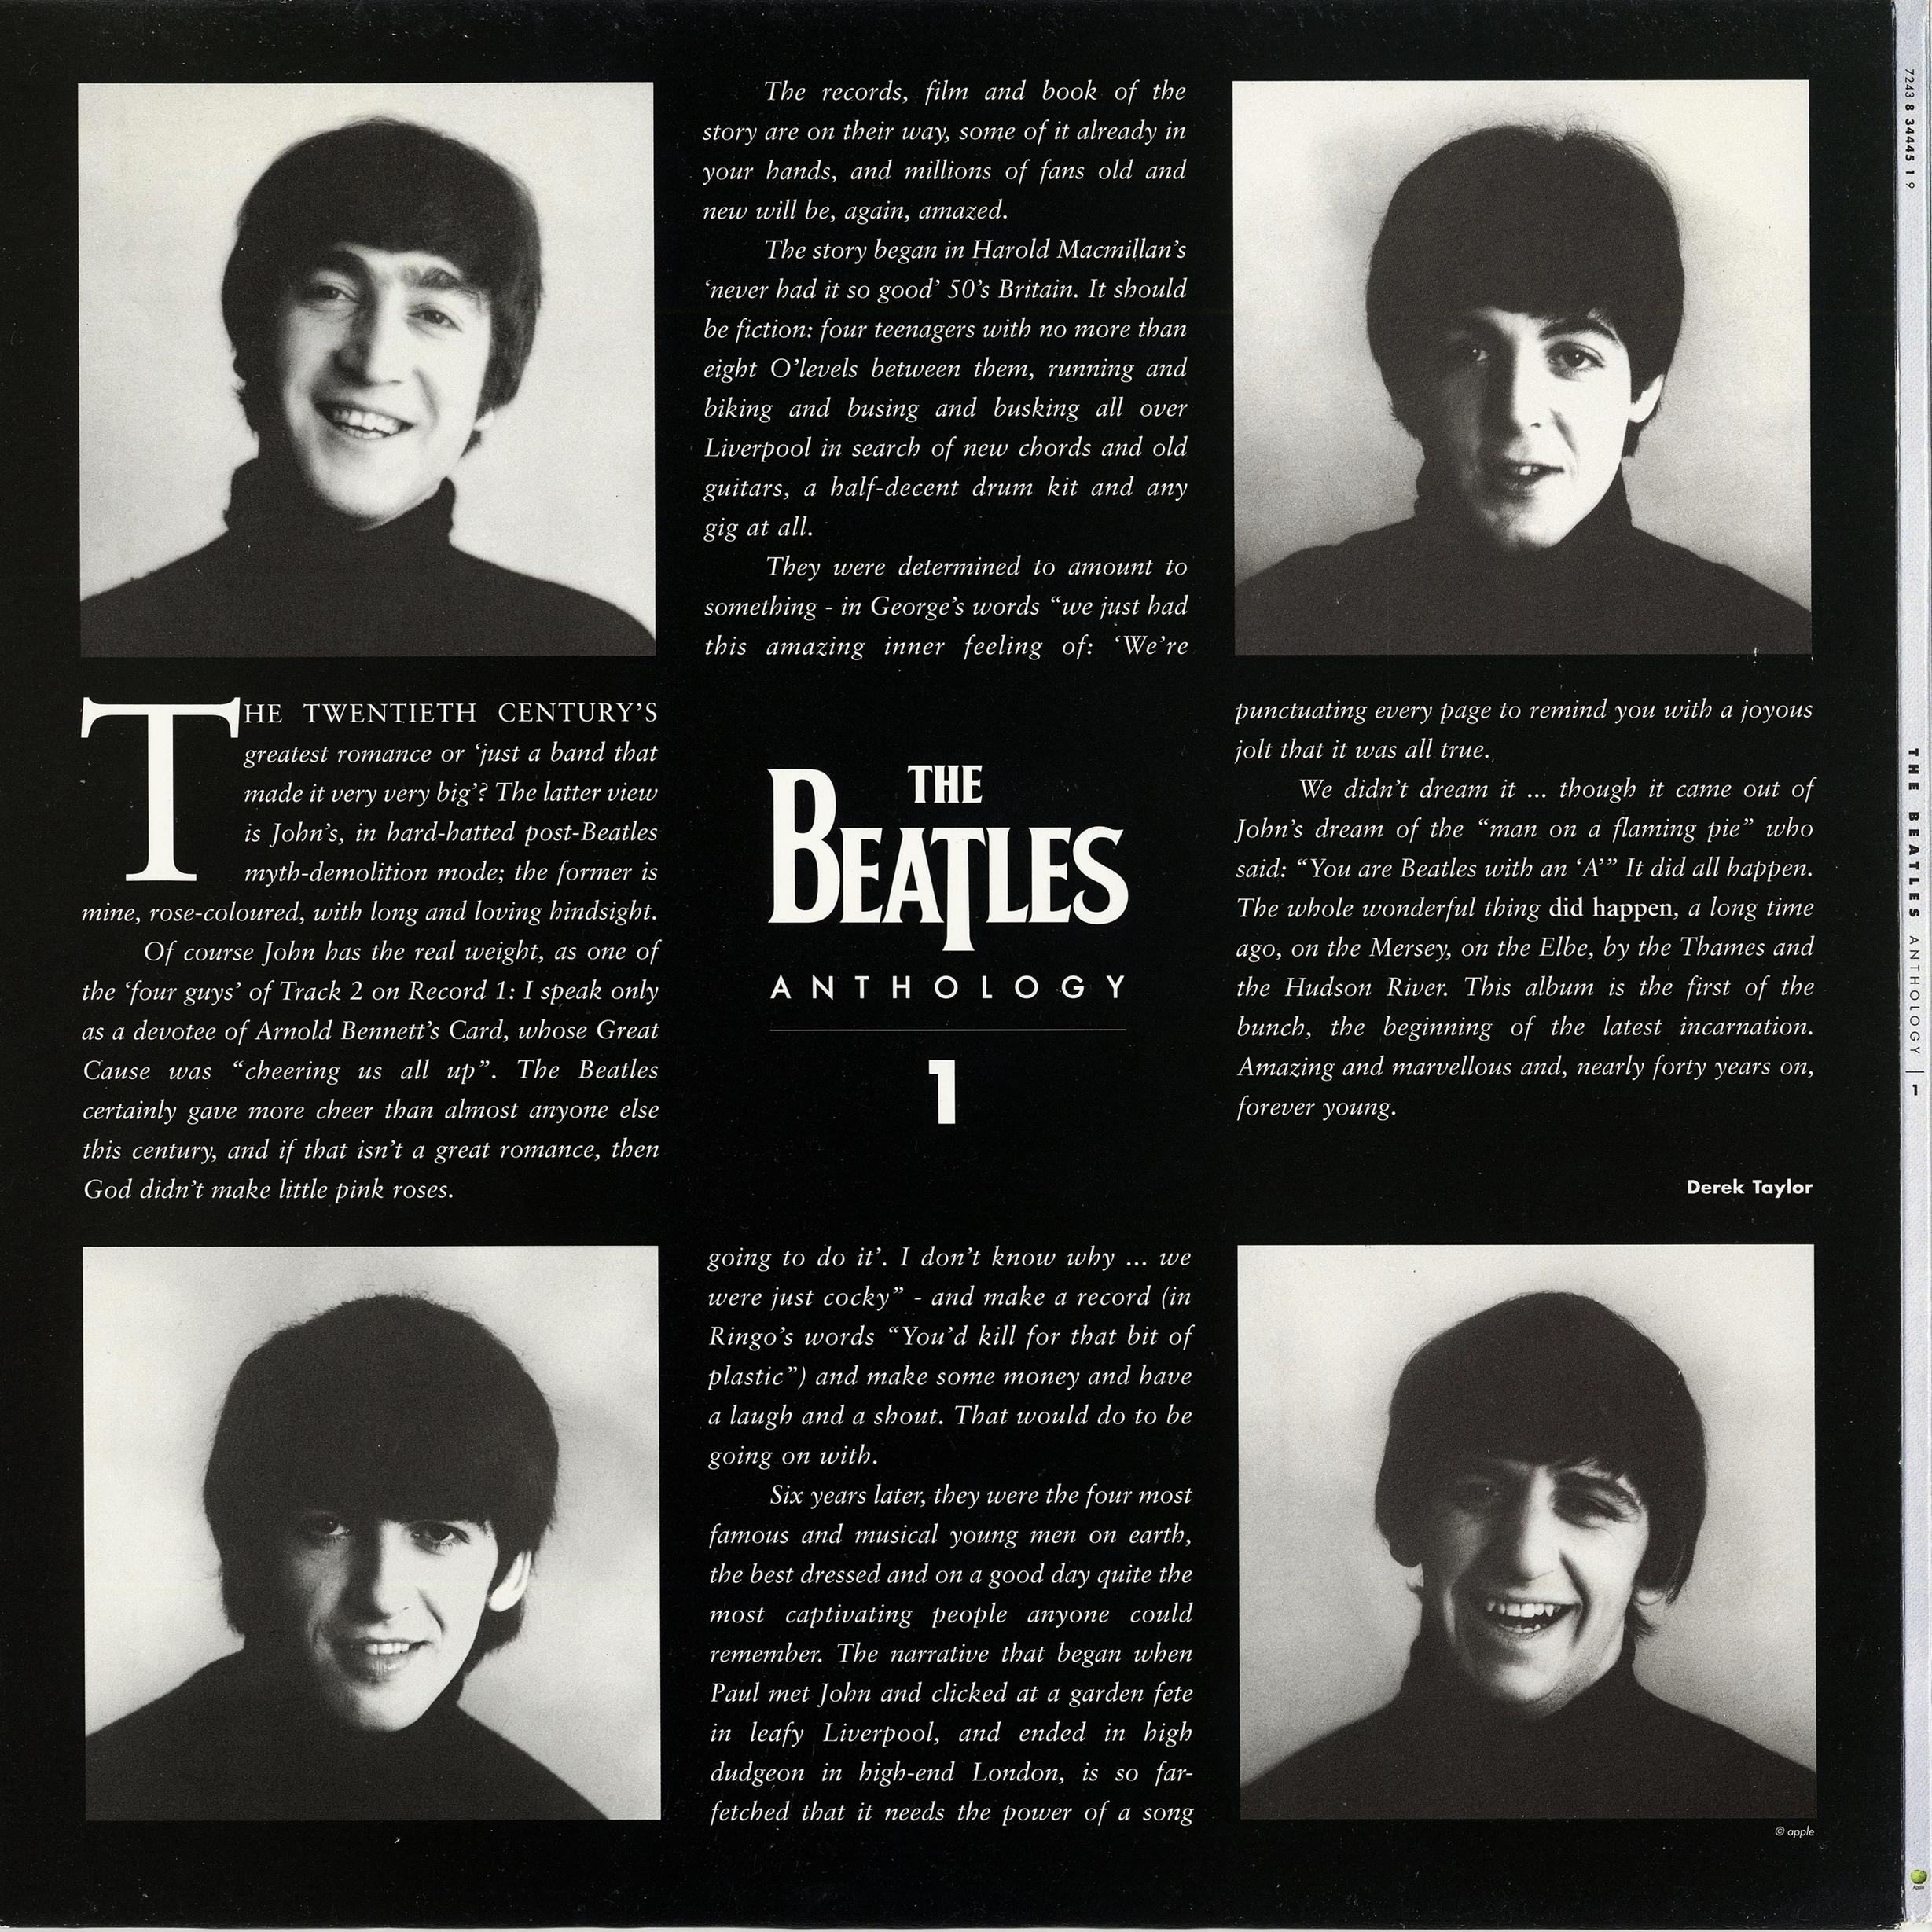 The Beatles - Anthology Box Set (iTunes LP) (2011) 15